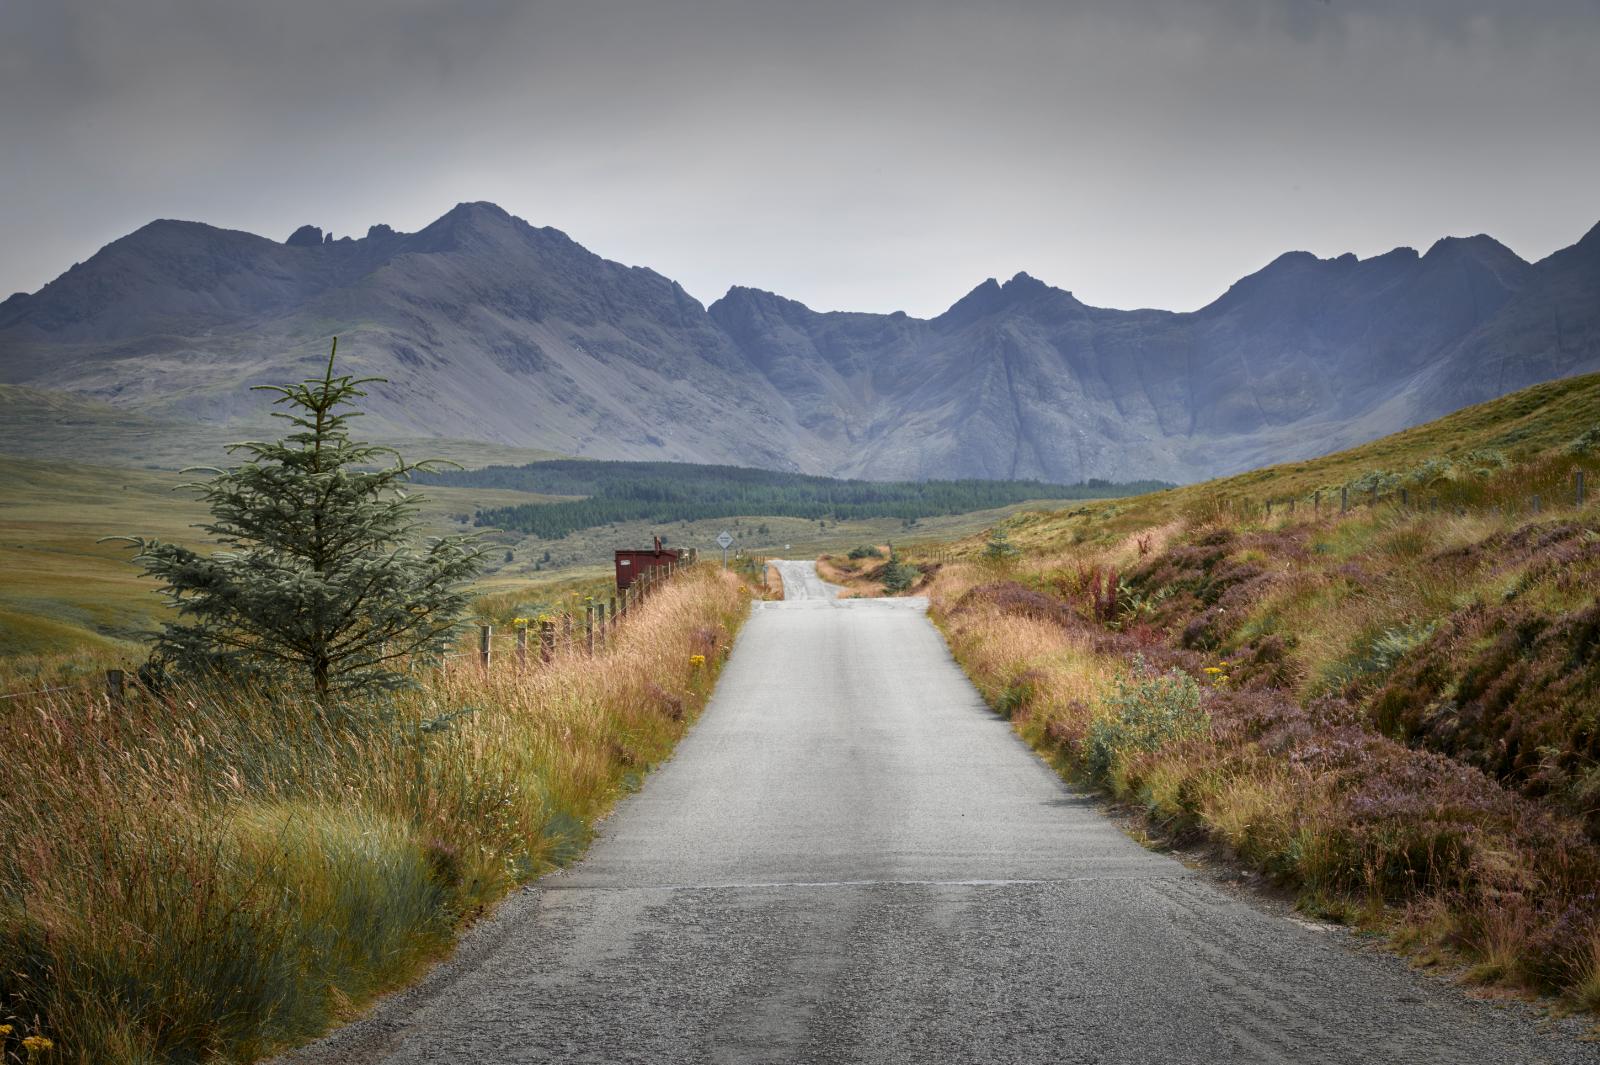 Skye Mountain Range, United Kingdom